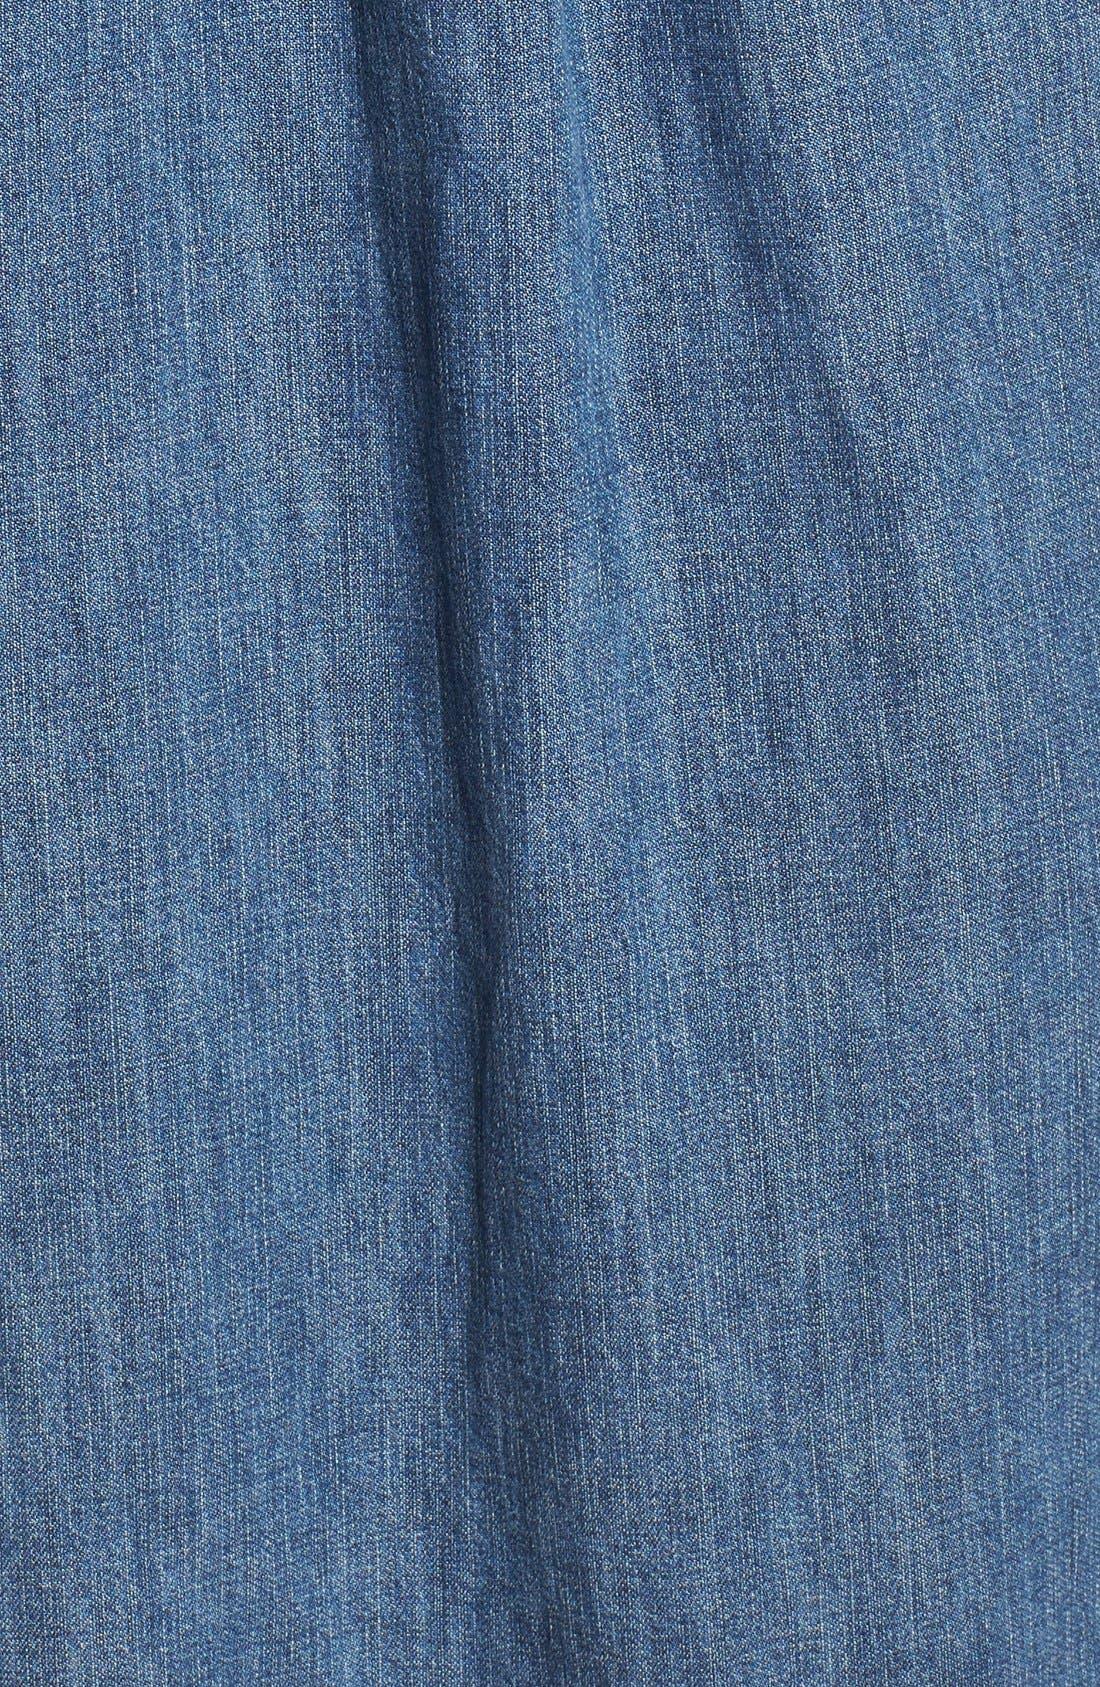 MADEWELL,                             Denim Shirtdress,                             Alternate thumbnail 2, color,                             405